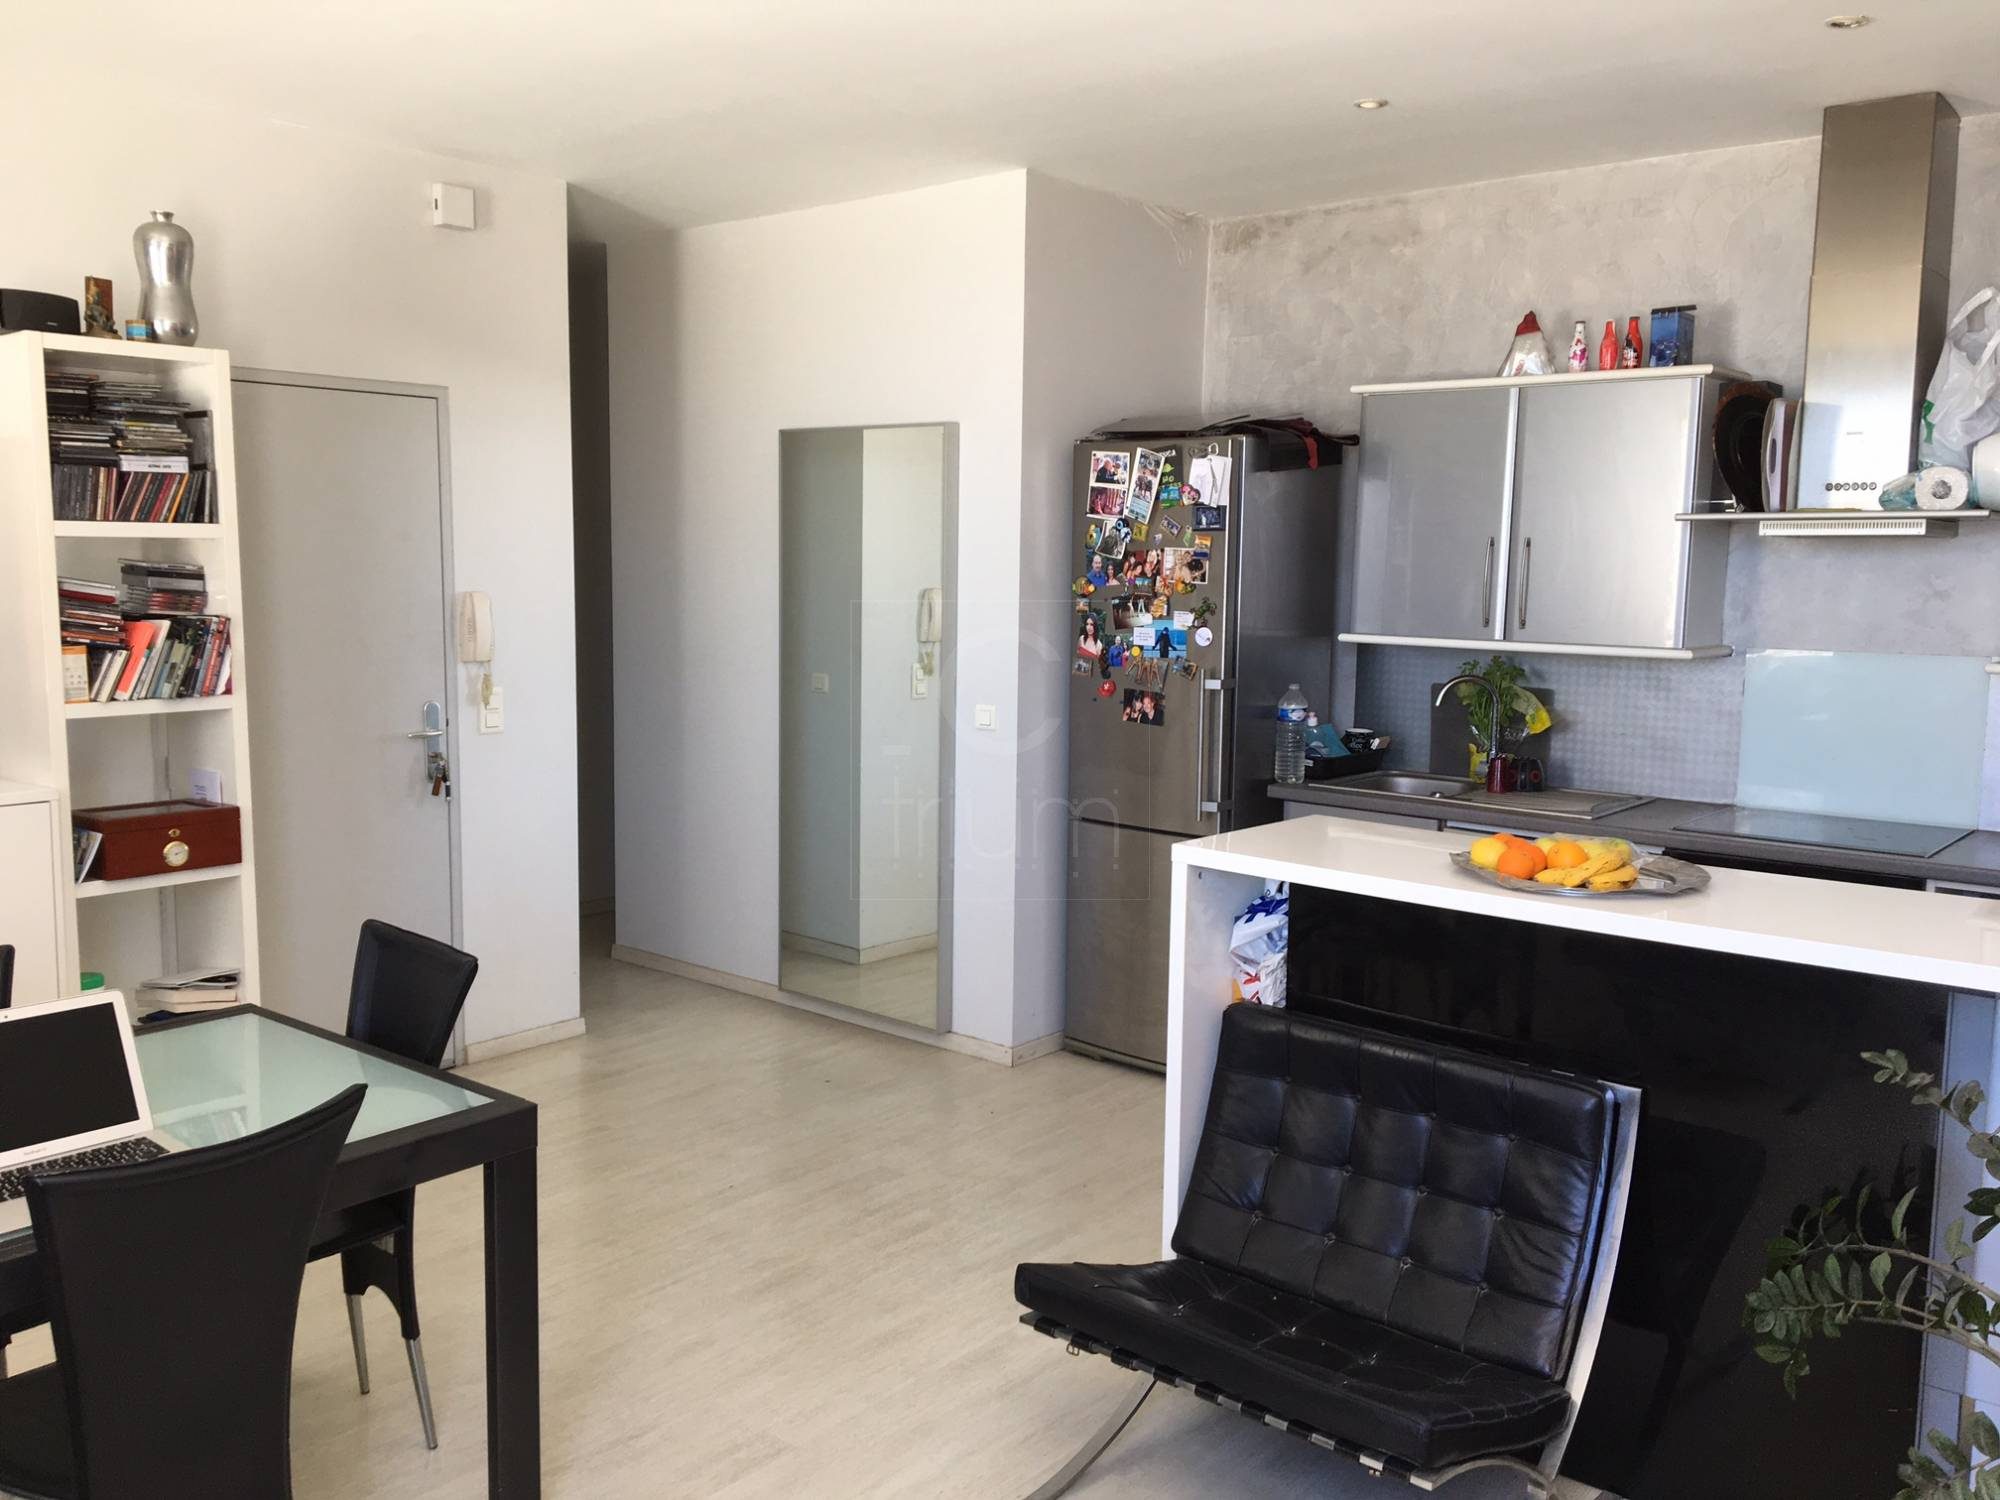 vente appartement t3 f3 marseille catalans vue mer agence immobili re marseille 7 me. Black Bedroom Furniture Sets. Home Design Ideas